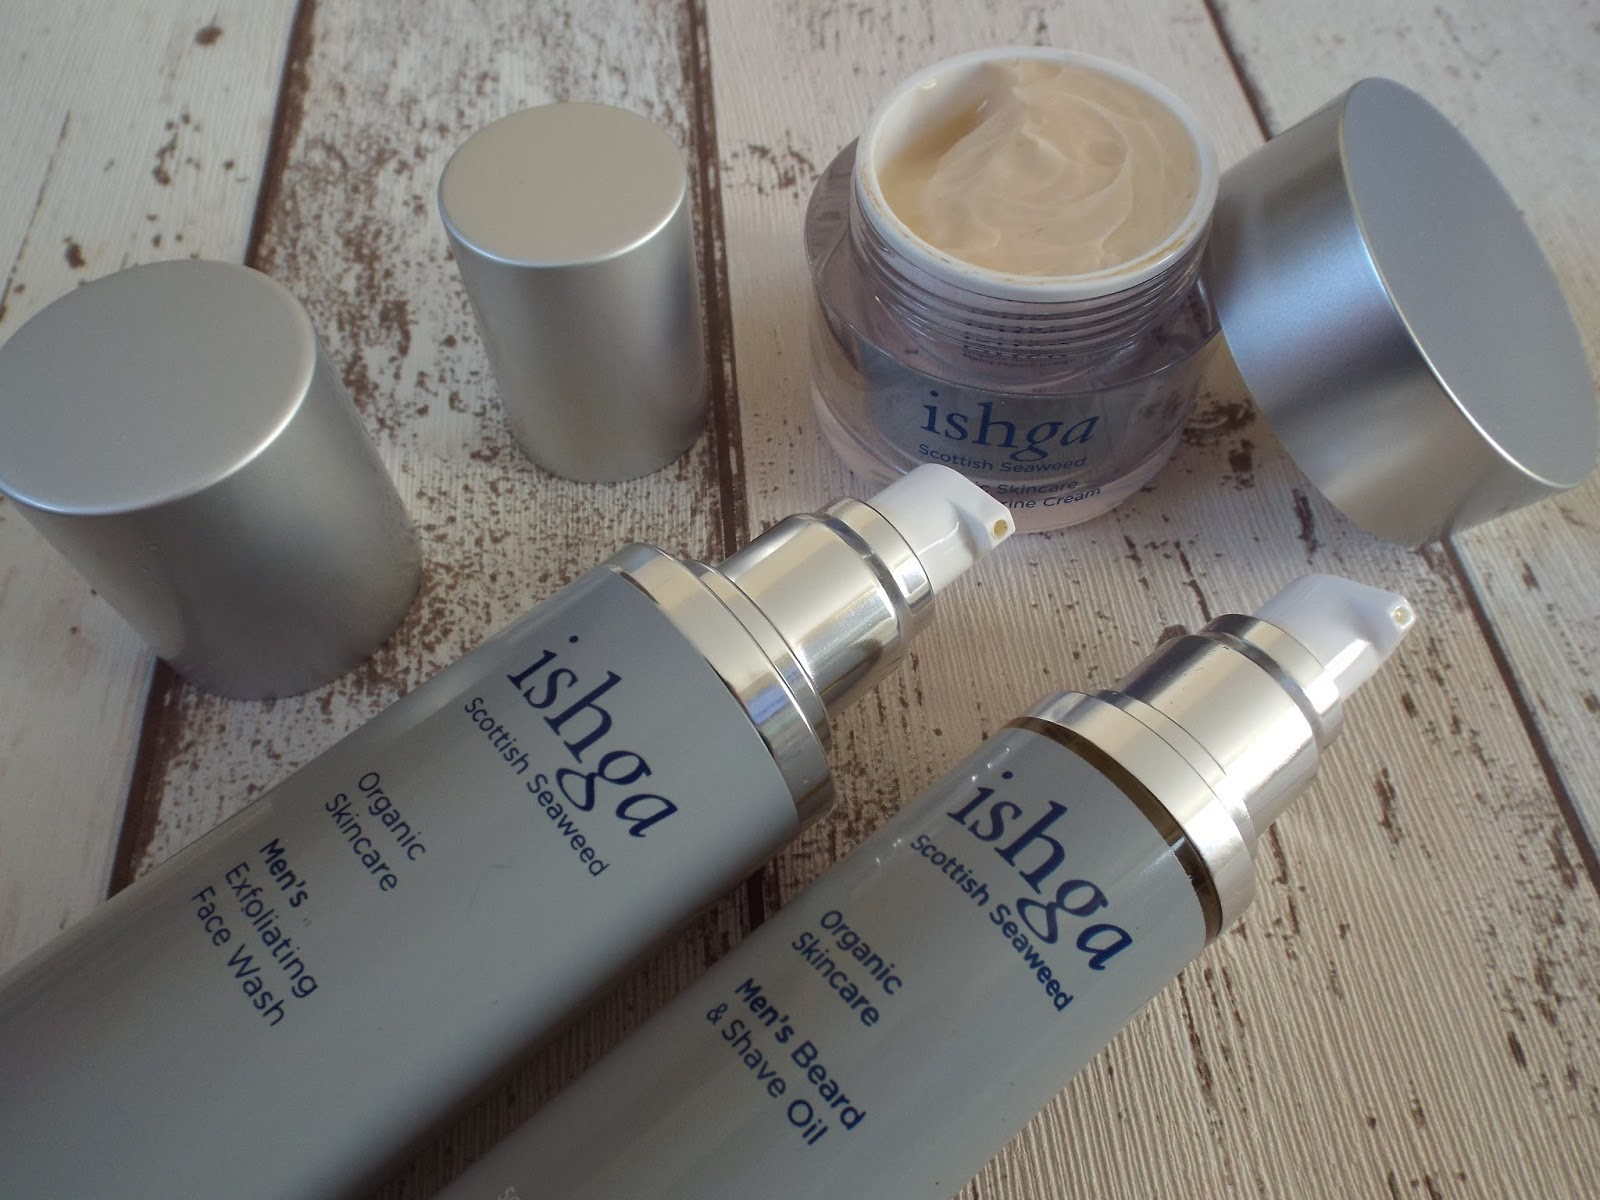 ISHGA Men's skincare products